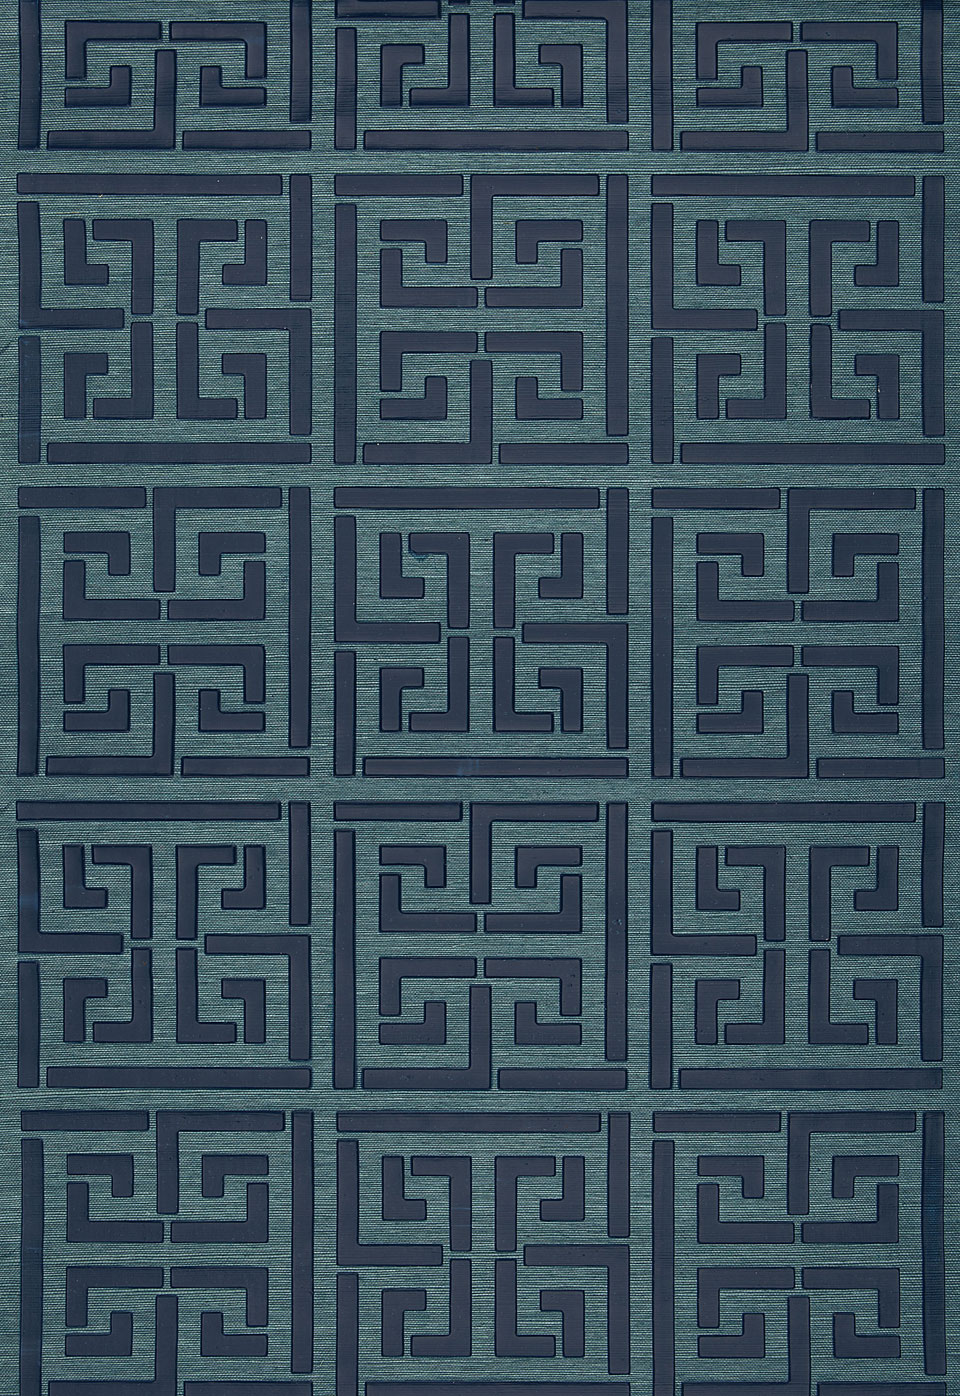 Greek Key Sisal Grasscloth Wallpaper by FSchumacher 960x1396